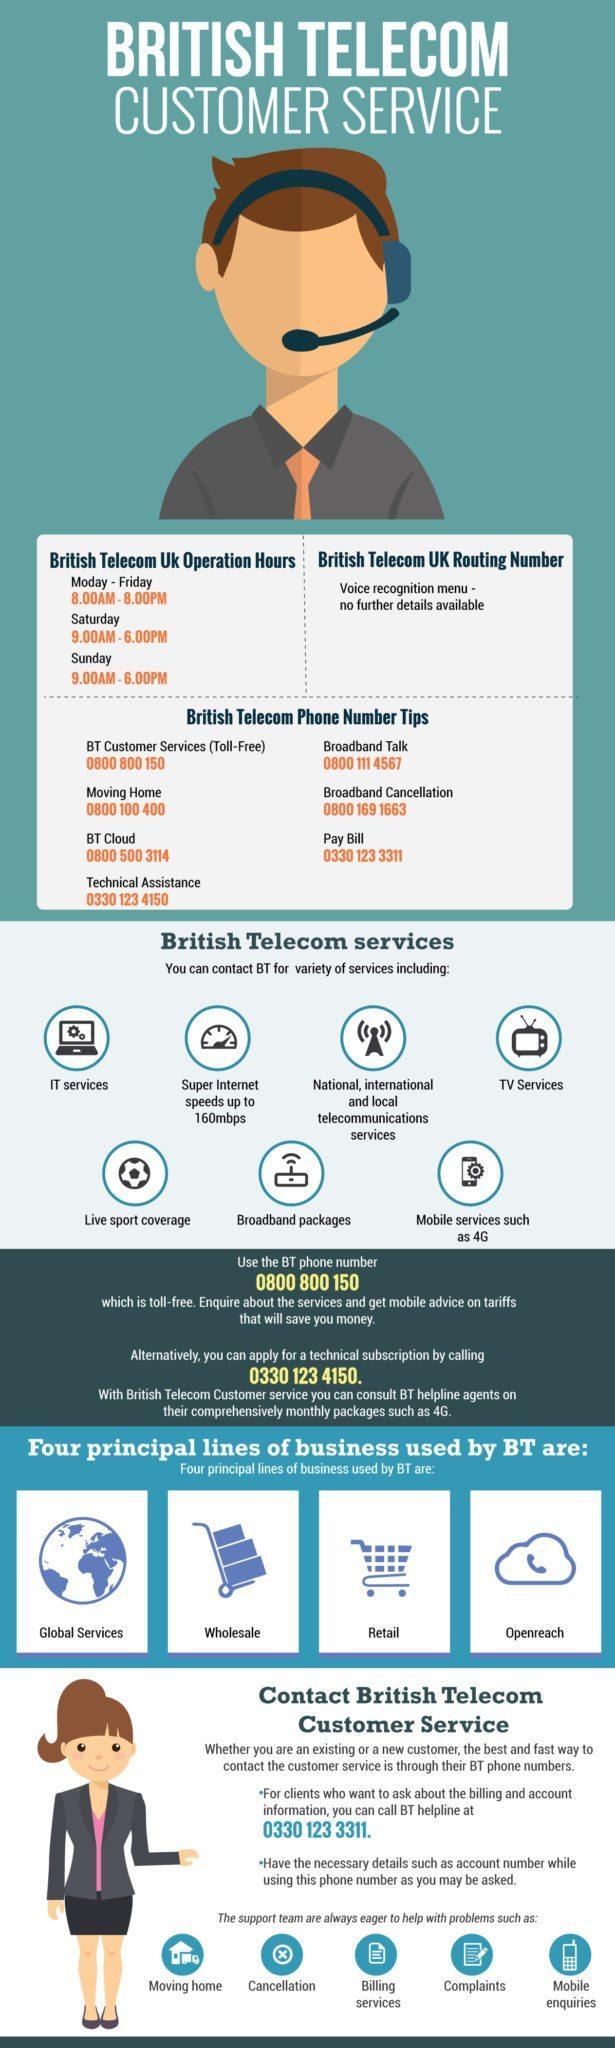 BT Broadband Customer Service Number